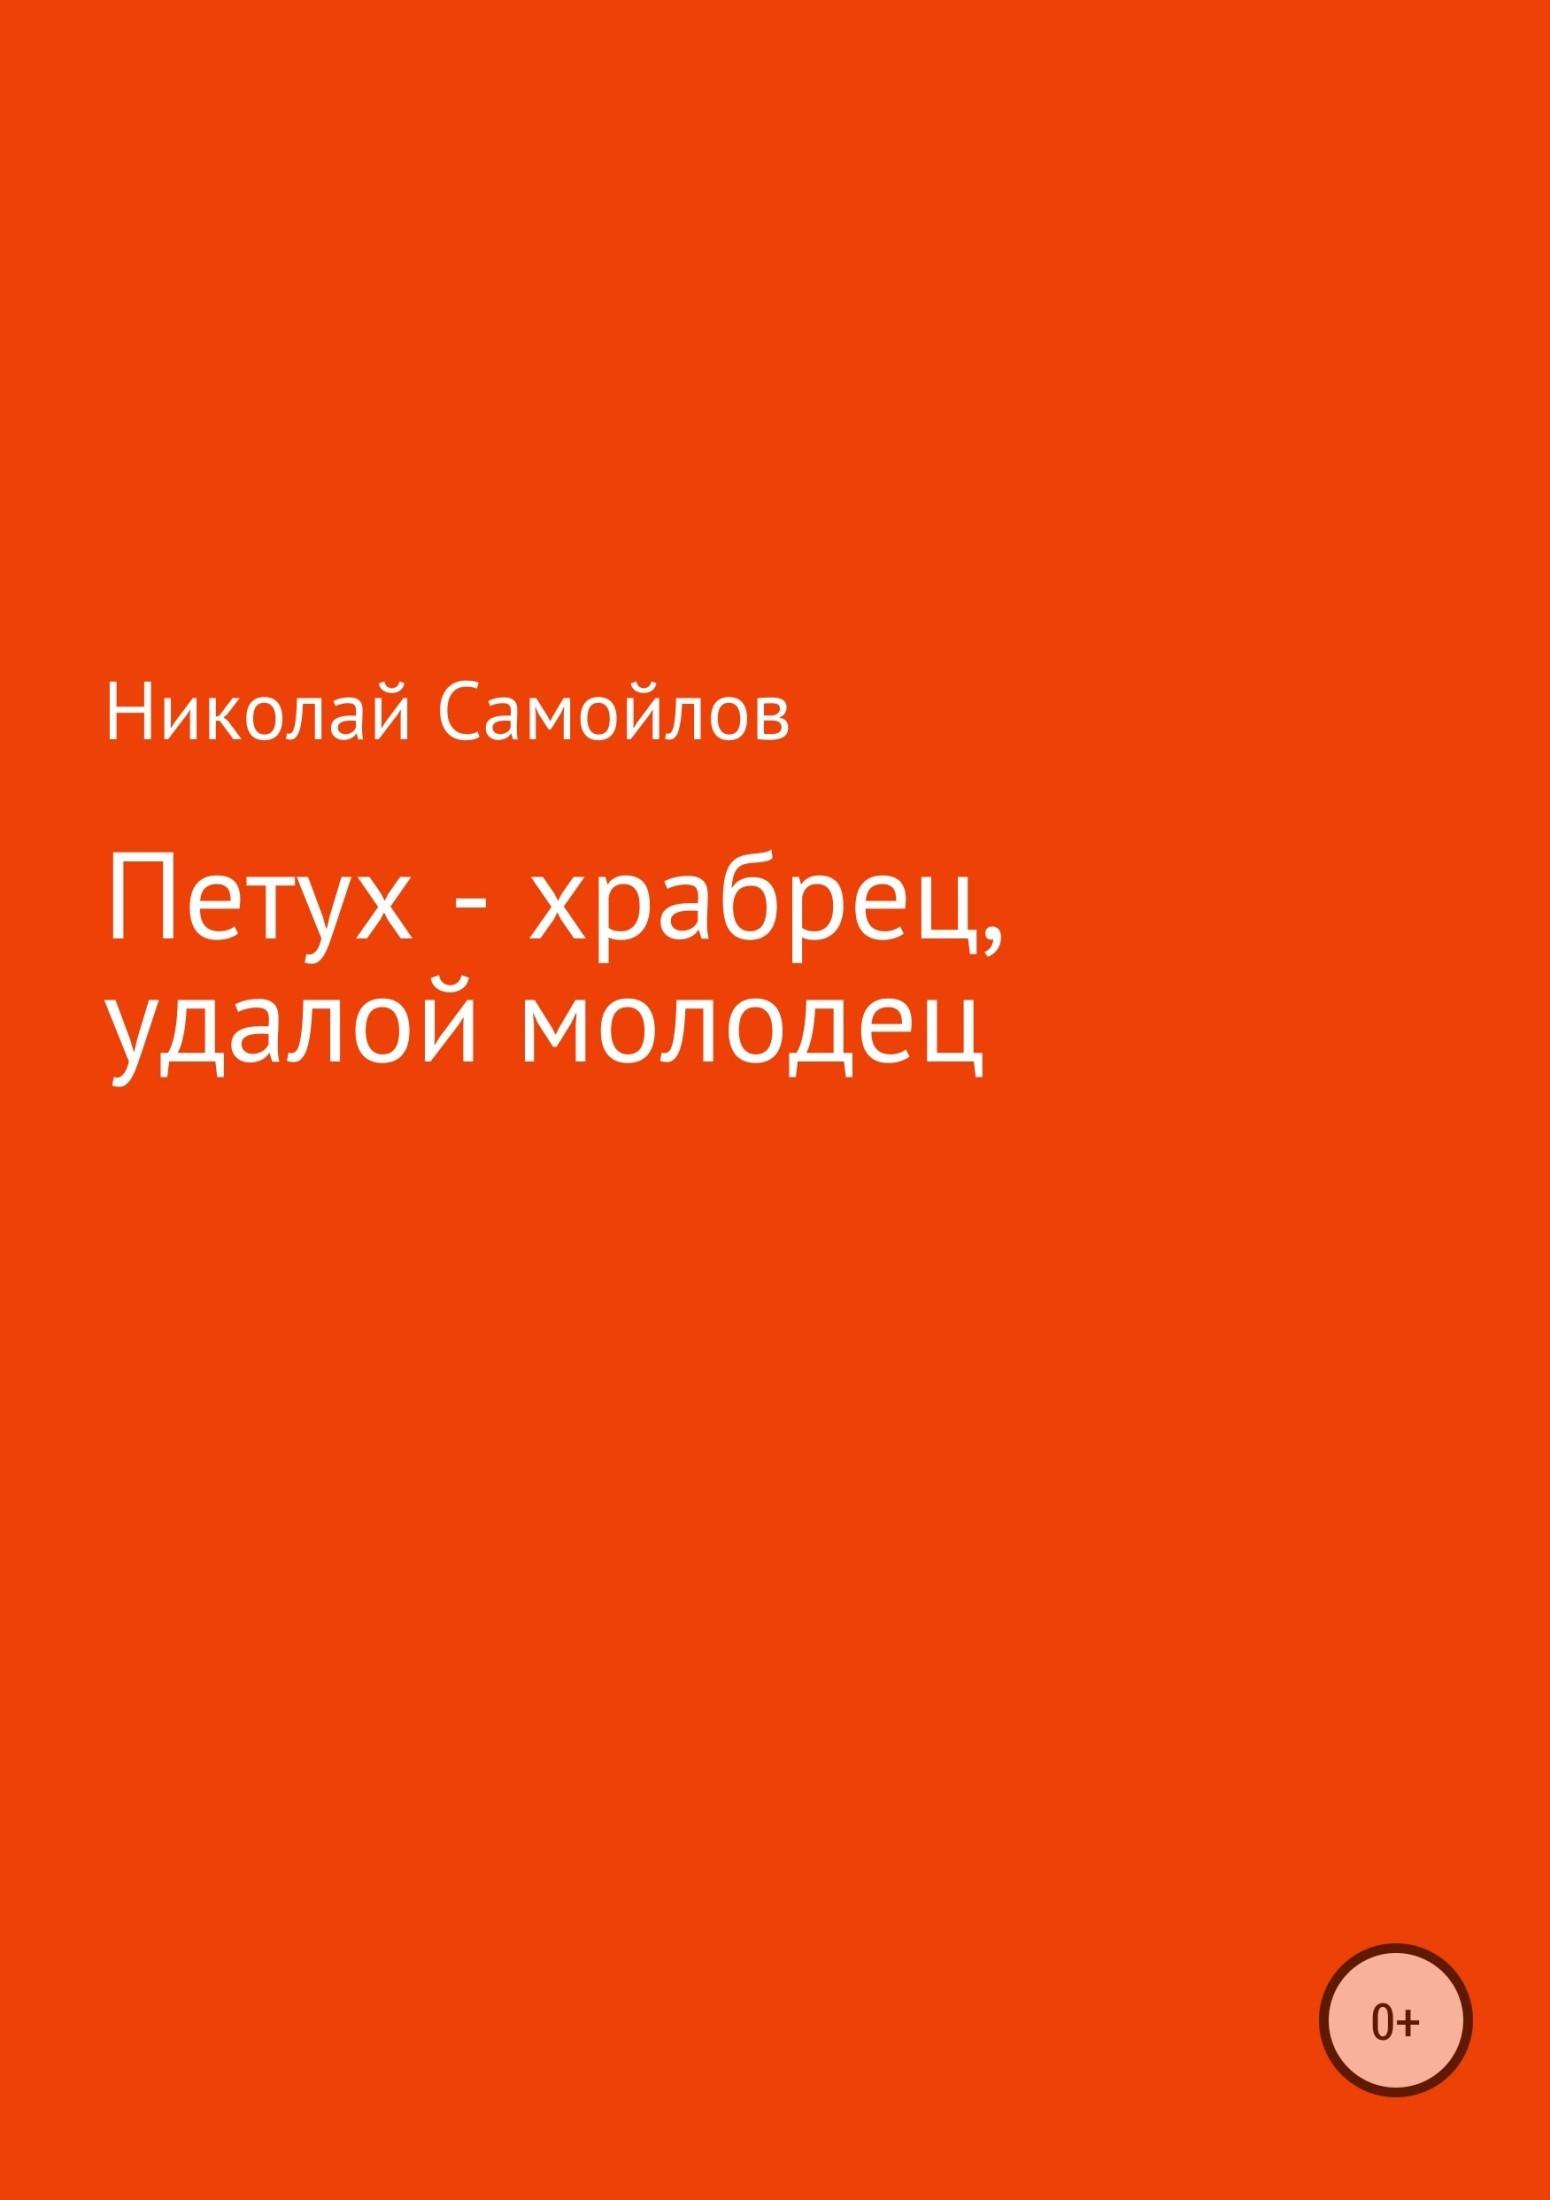 Николай Николаевич Самойлов Петух – храбрец, удалой молодец